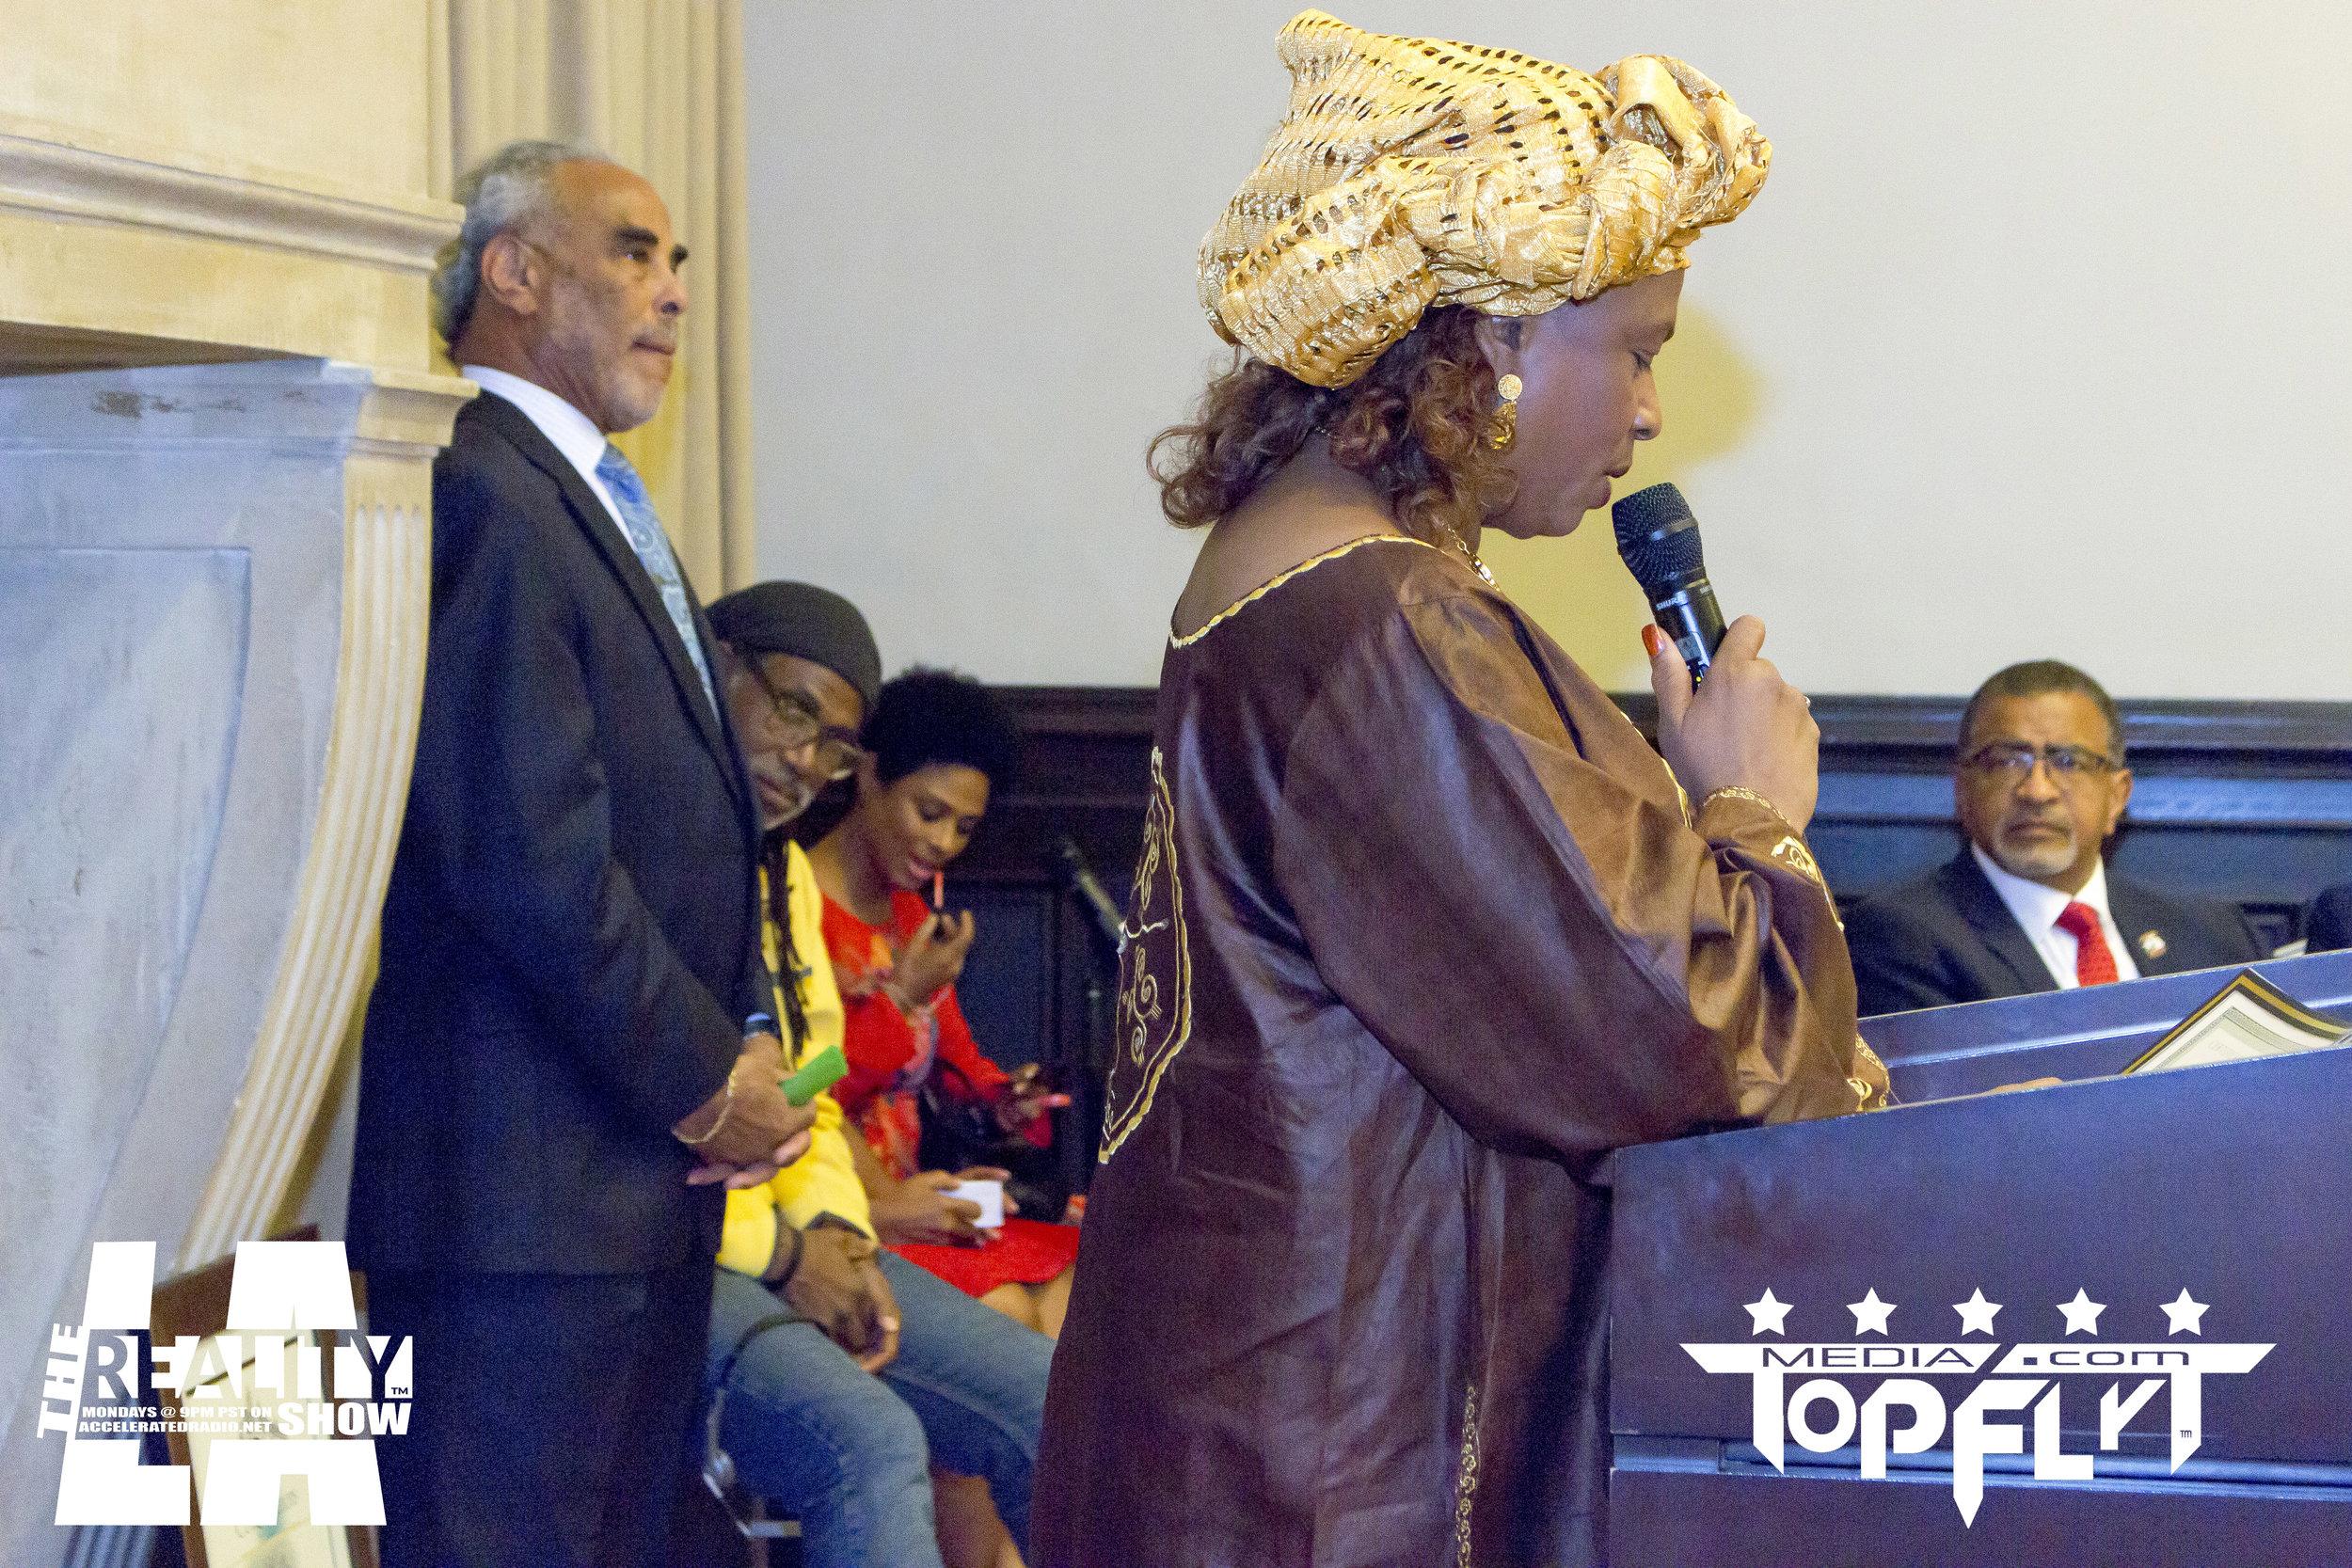 The Reality Show LA - Tuskegee Airmen 75th Anniversary VIP Reception_146.jpg